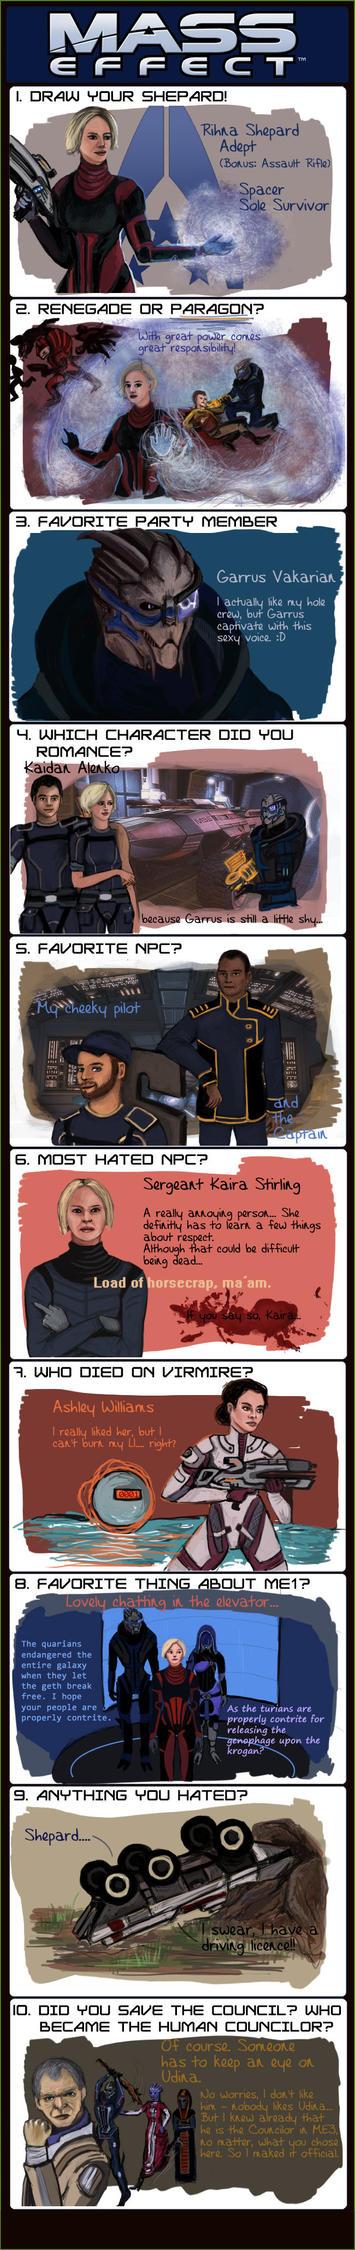 Mass Effect Meme by Alvadea